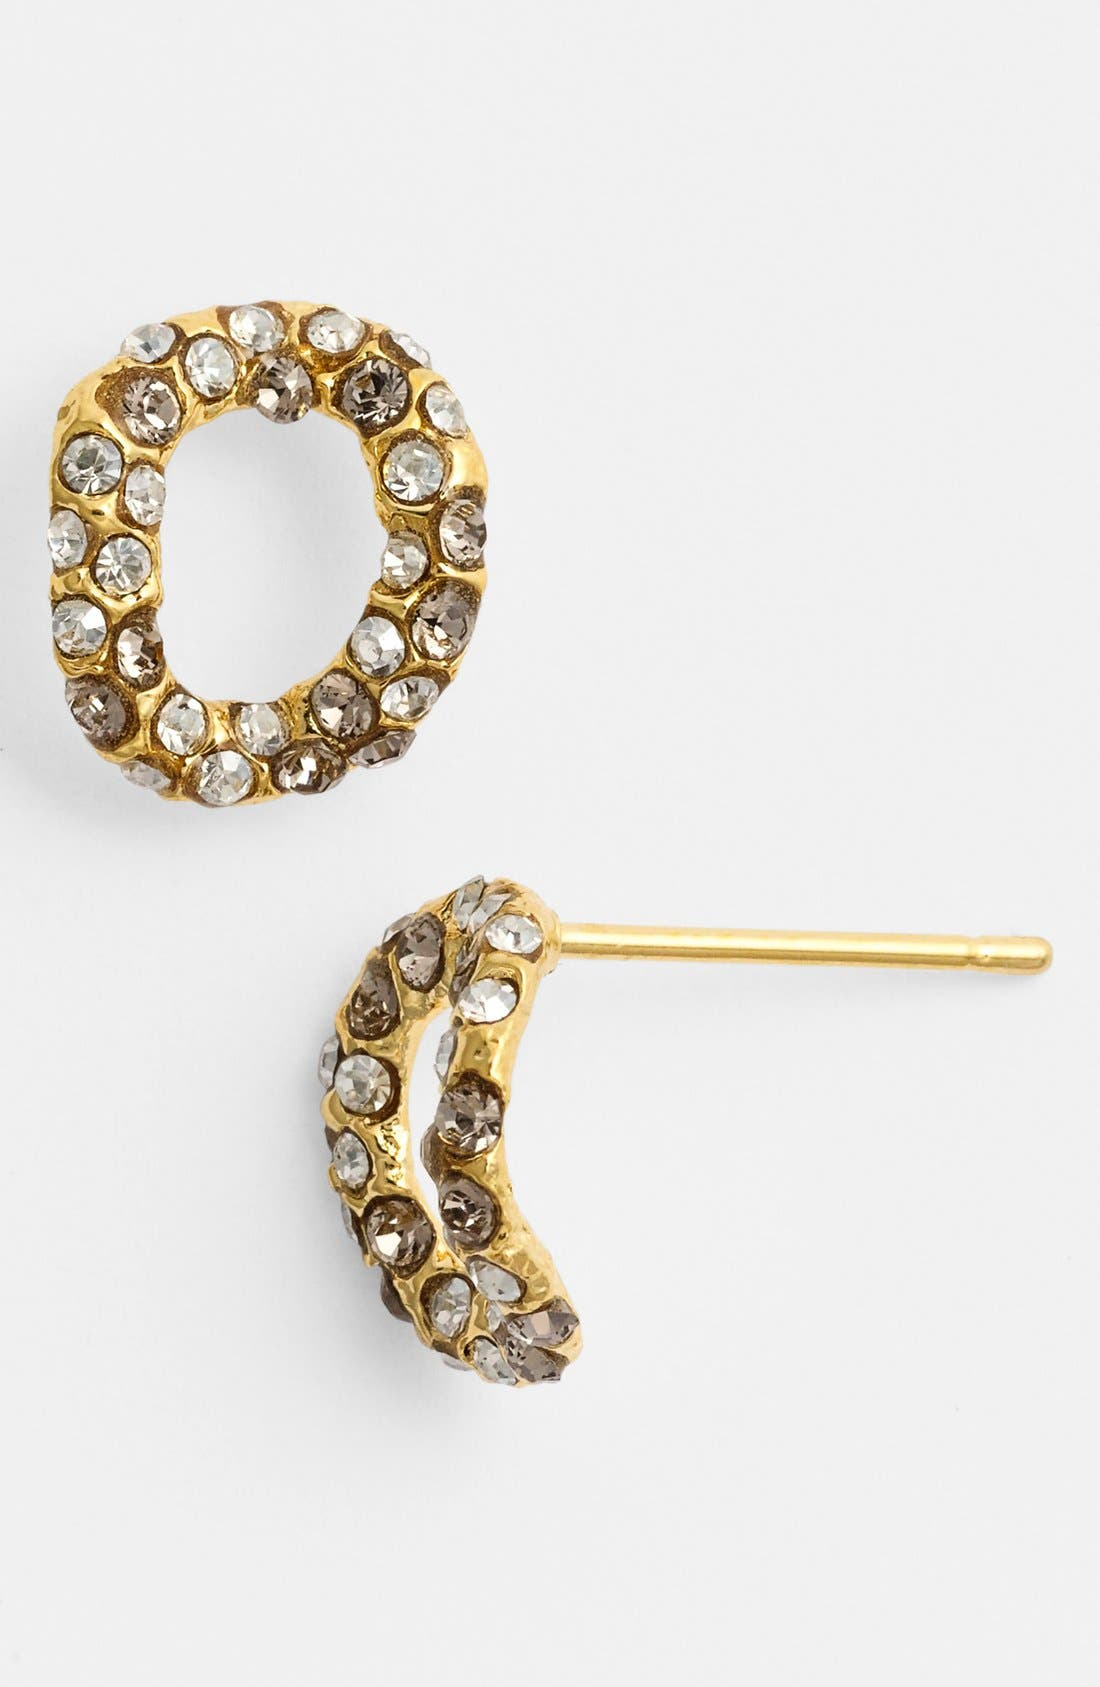 Main Image - Alexis Bittar 'Elements - Jardin de Papillon' Chain Link Stud Earrings